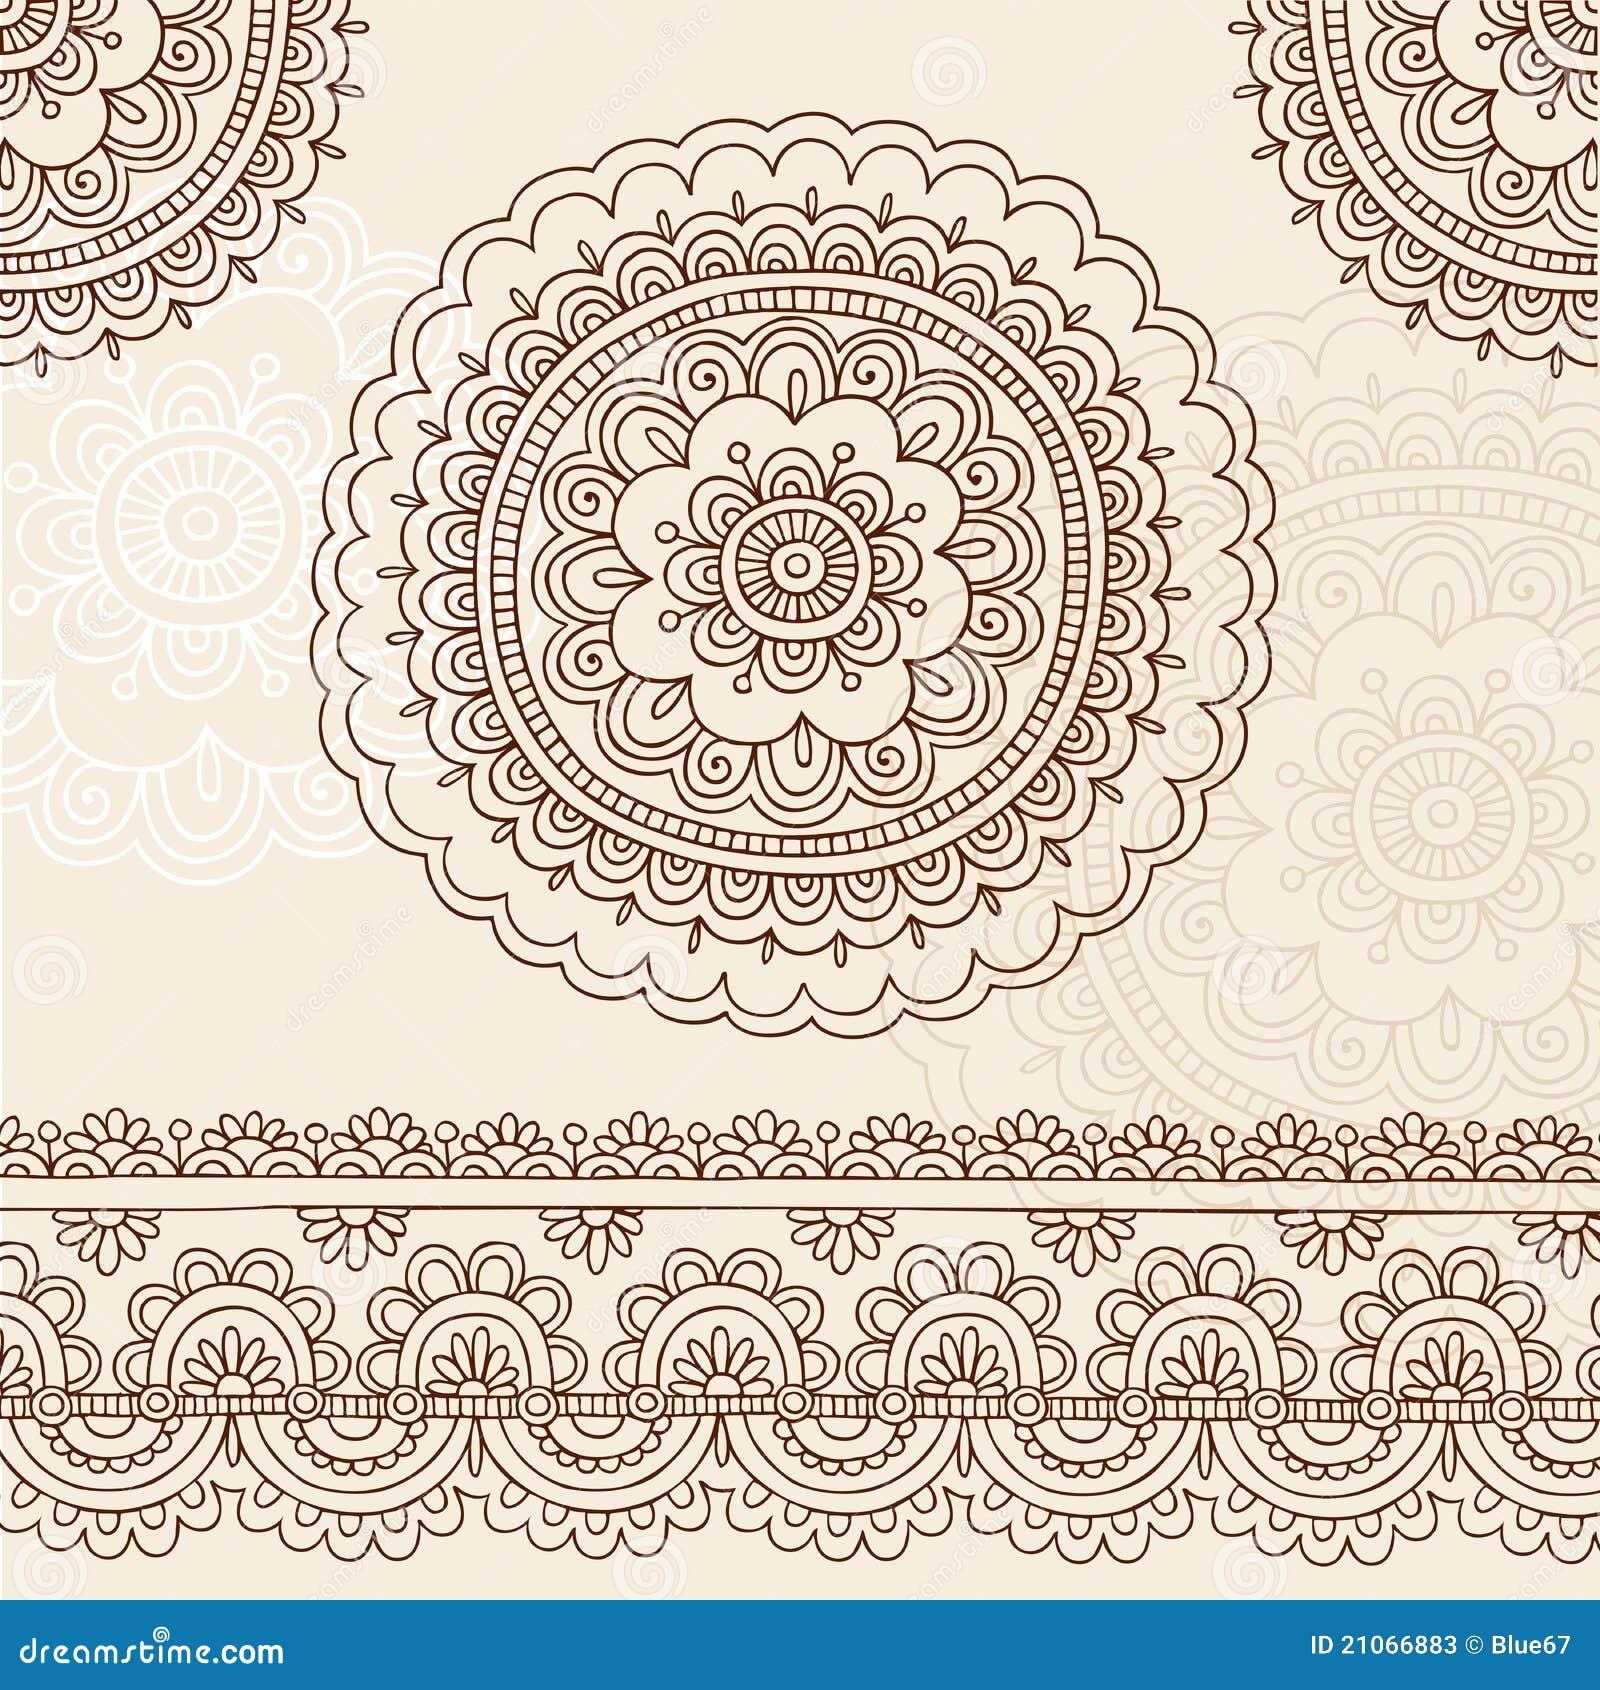 Henna mehndi mandala doodle vector design elements stock - Doodle dessin ...